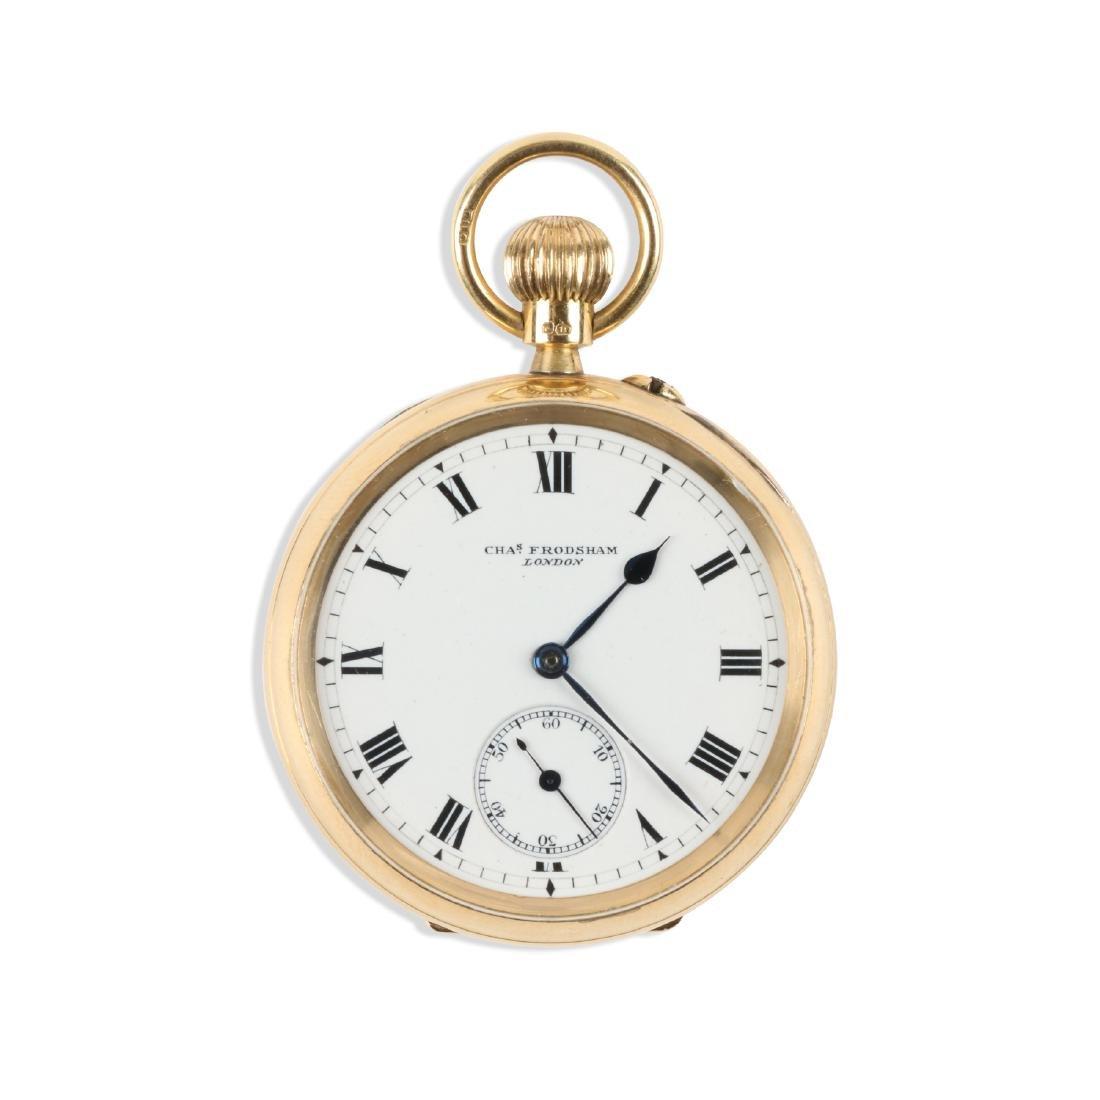 Charles Frodsham, London, 18K Pocket Watch